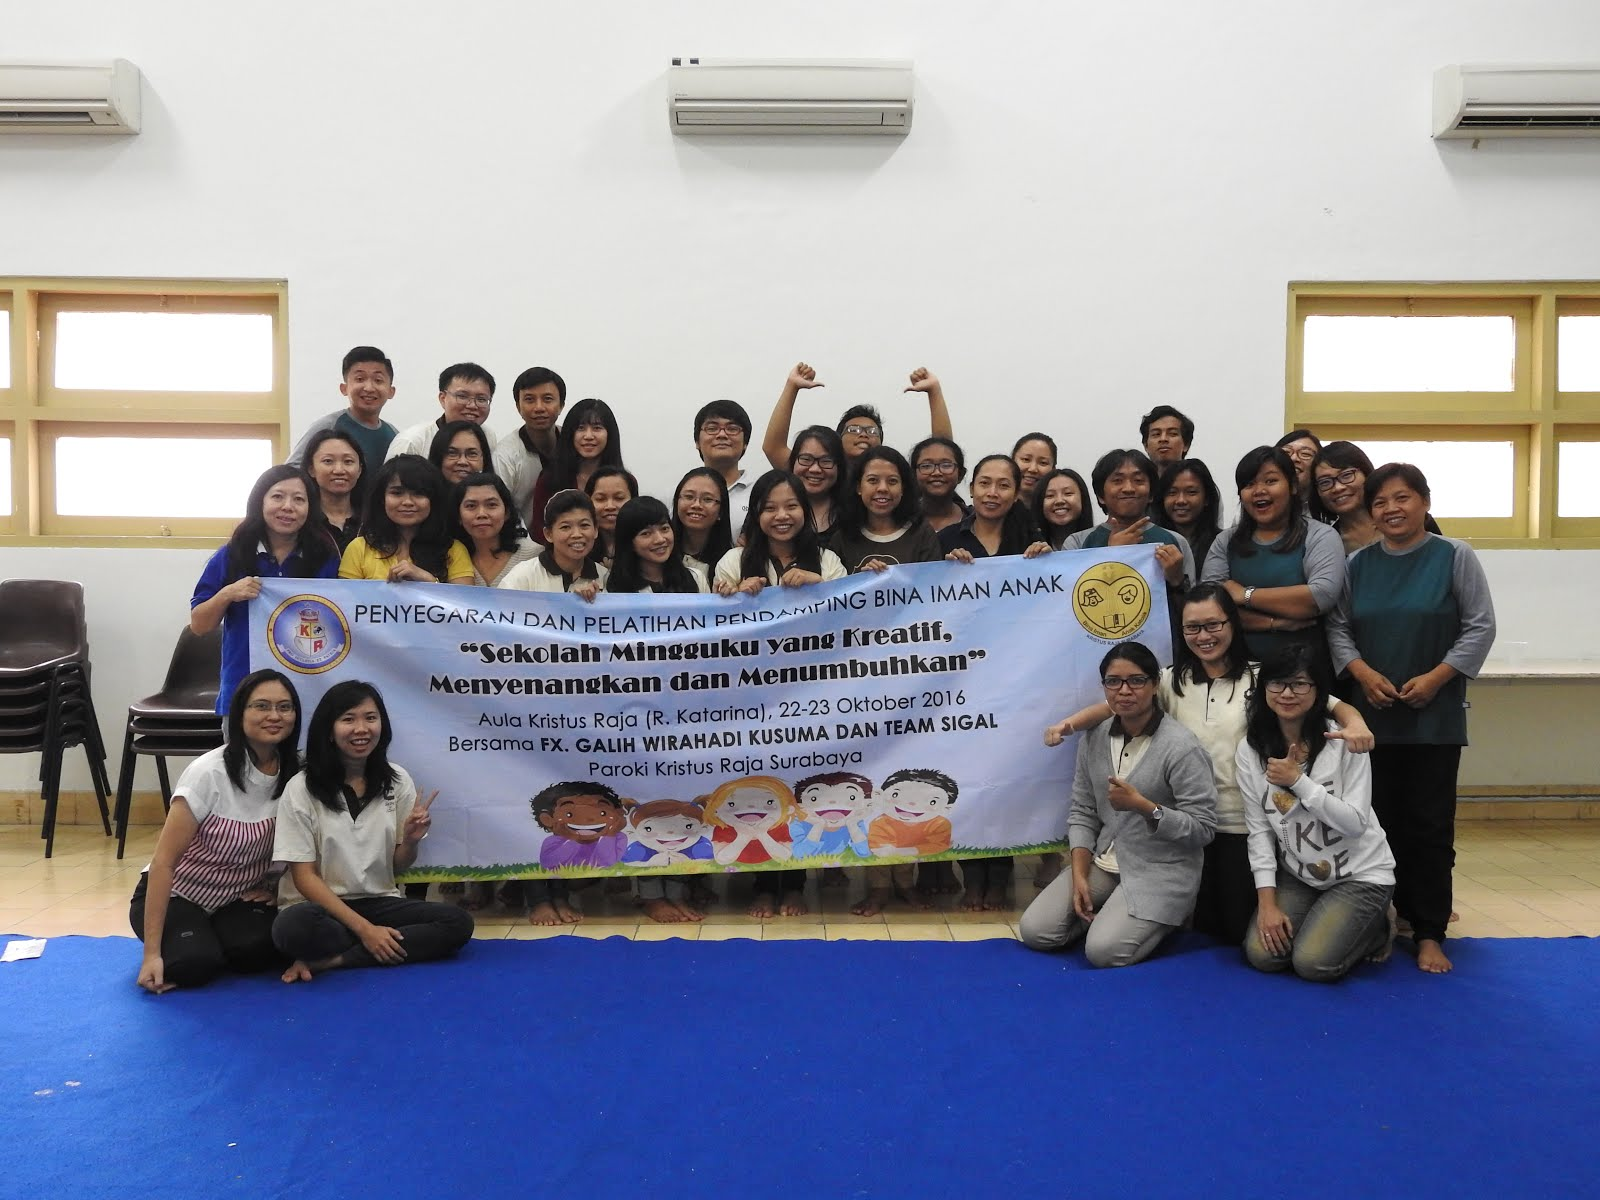 Bersama pendamping BIAK Paroki Kristus Raja Surabaya (22-23 Oktober 2016)